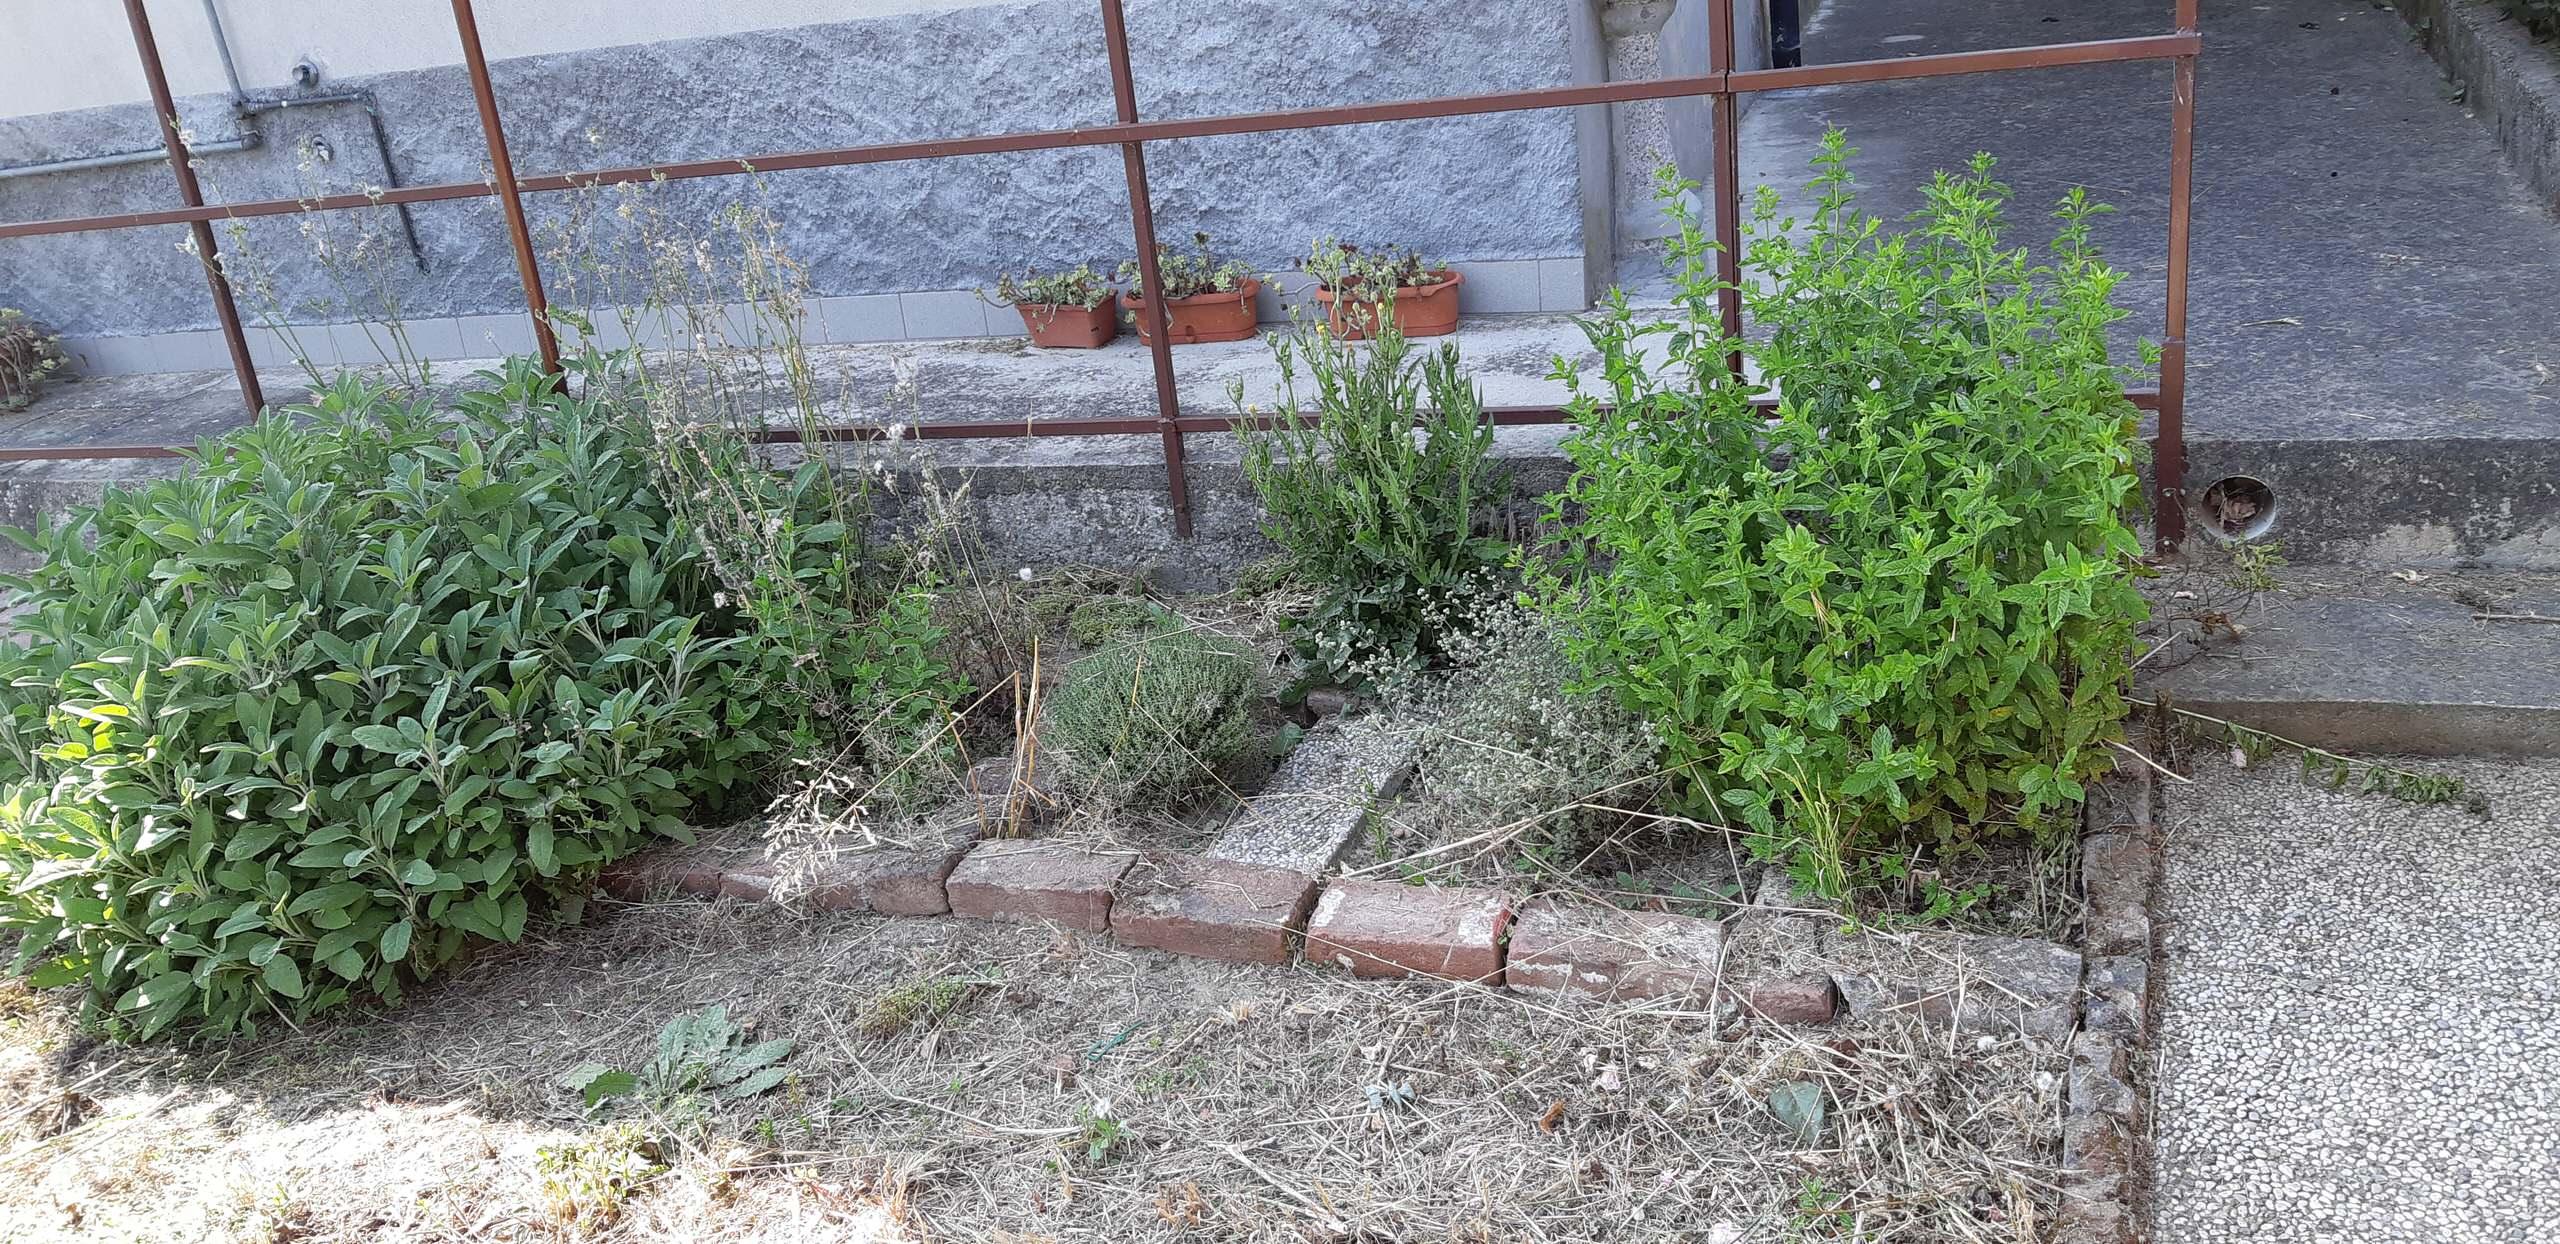 Giardino privato G. D.R.